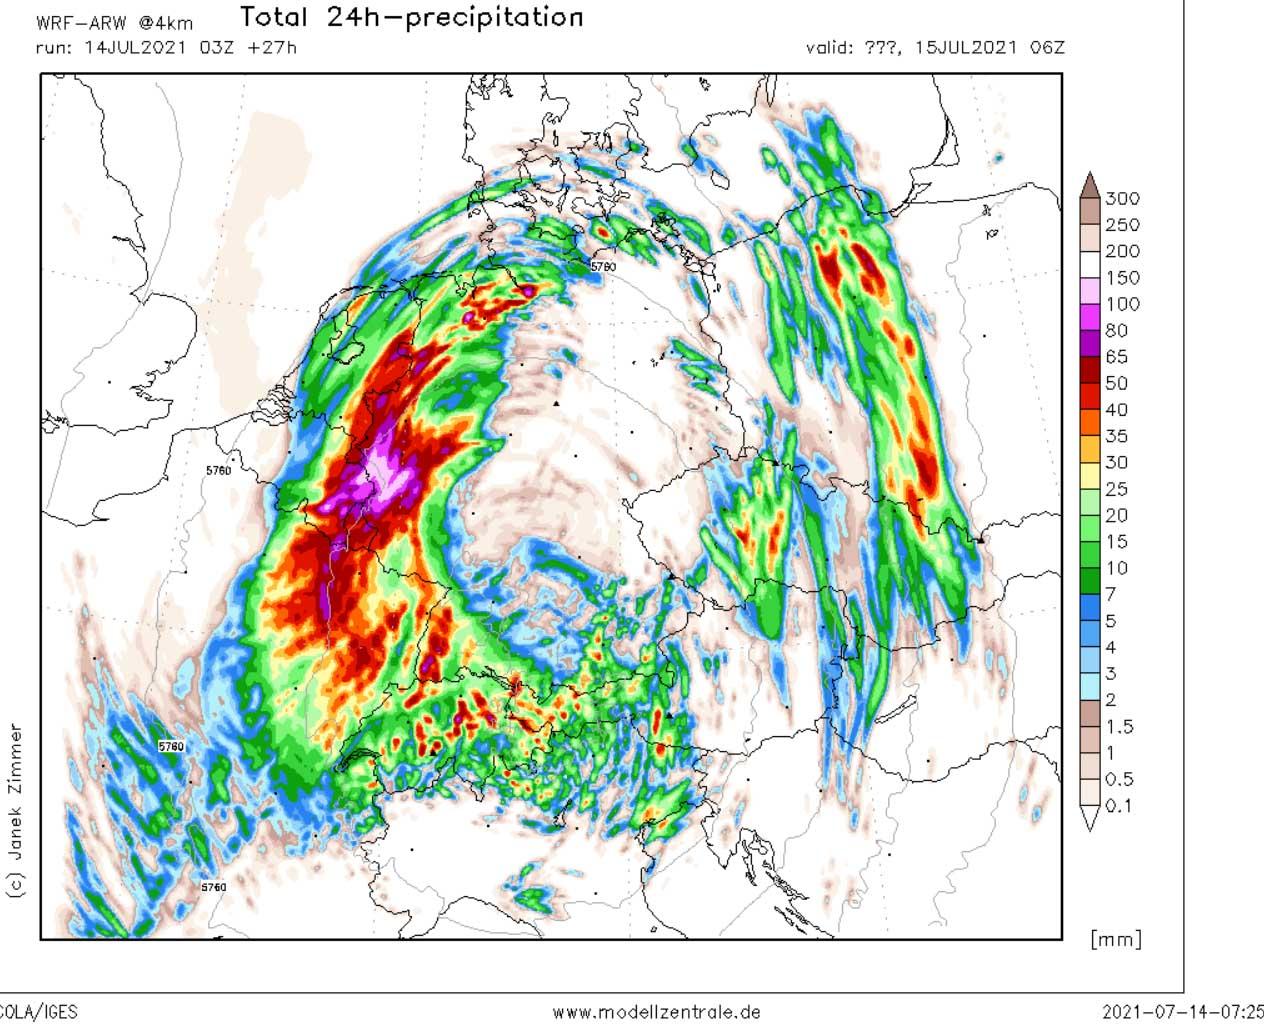 destructive-flooding-germany-belgium-total-rainfall